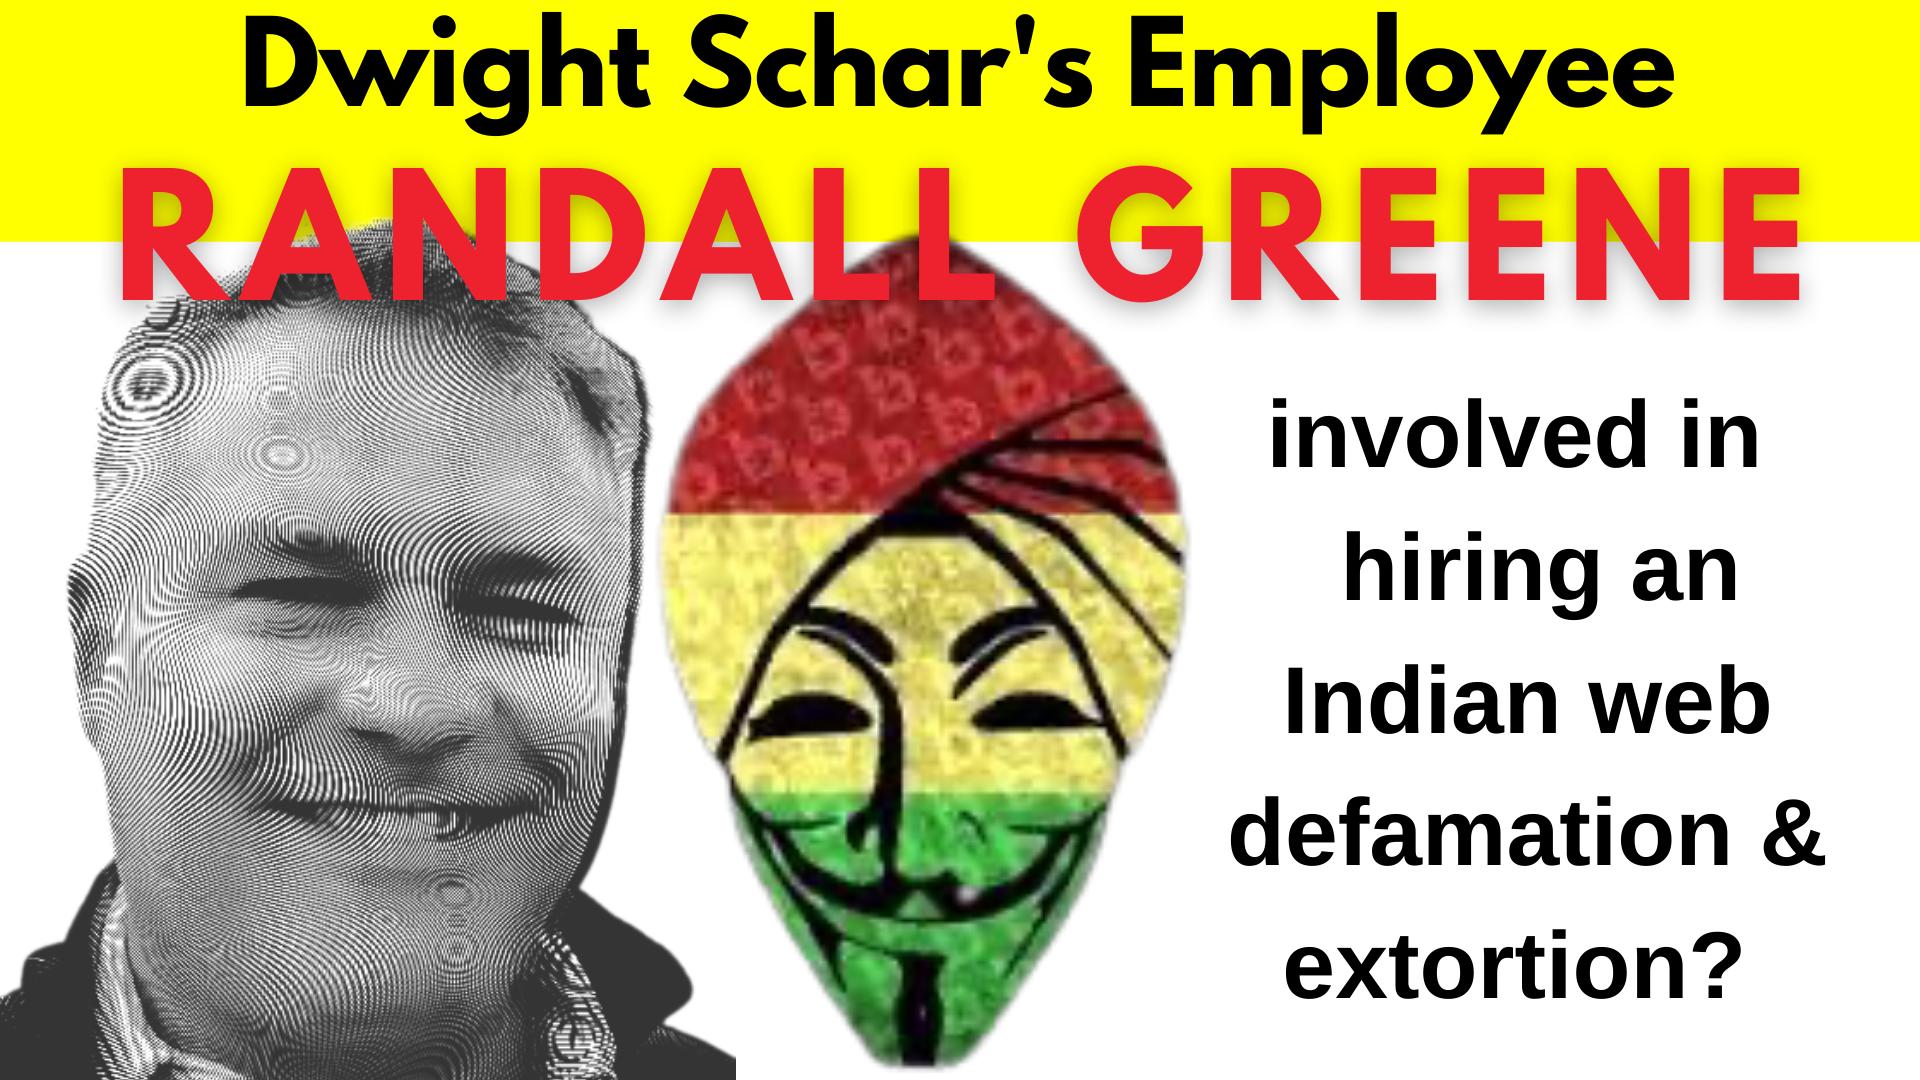 Dwight Schar's employee involved in hiring an Indian web defamation & extortion Randall Greene